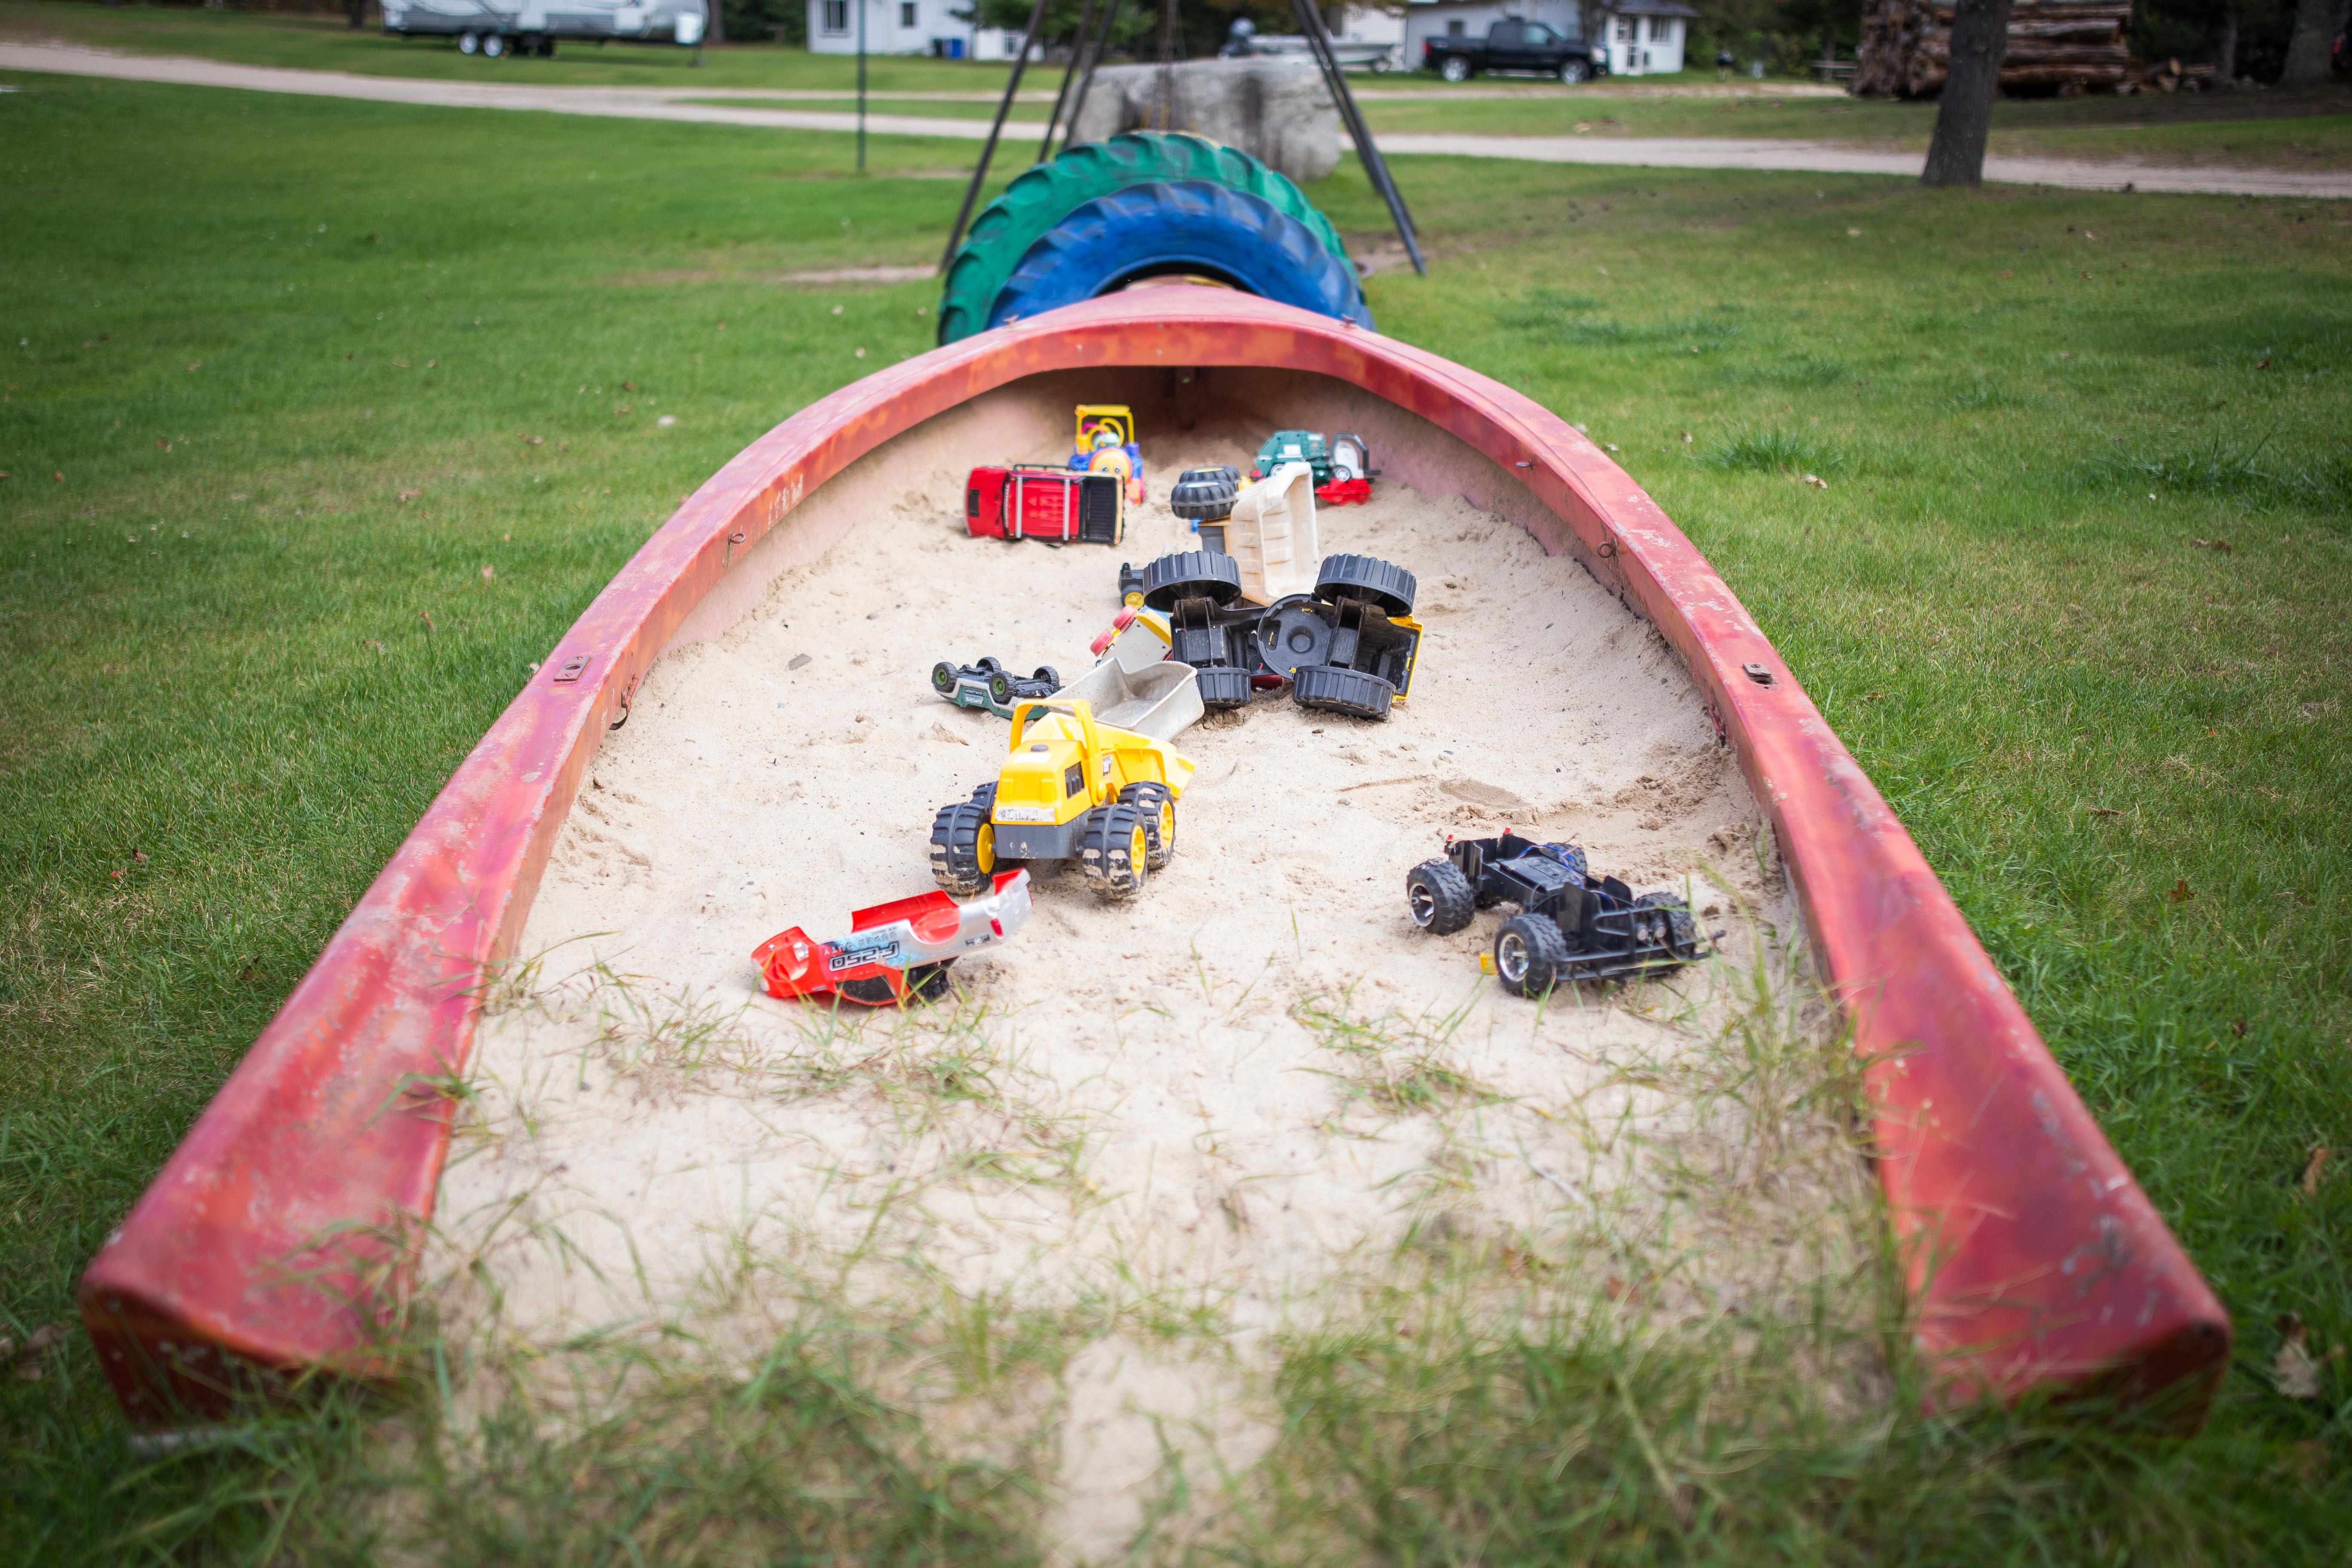 Old Boat Sandbox